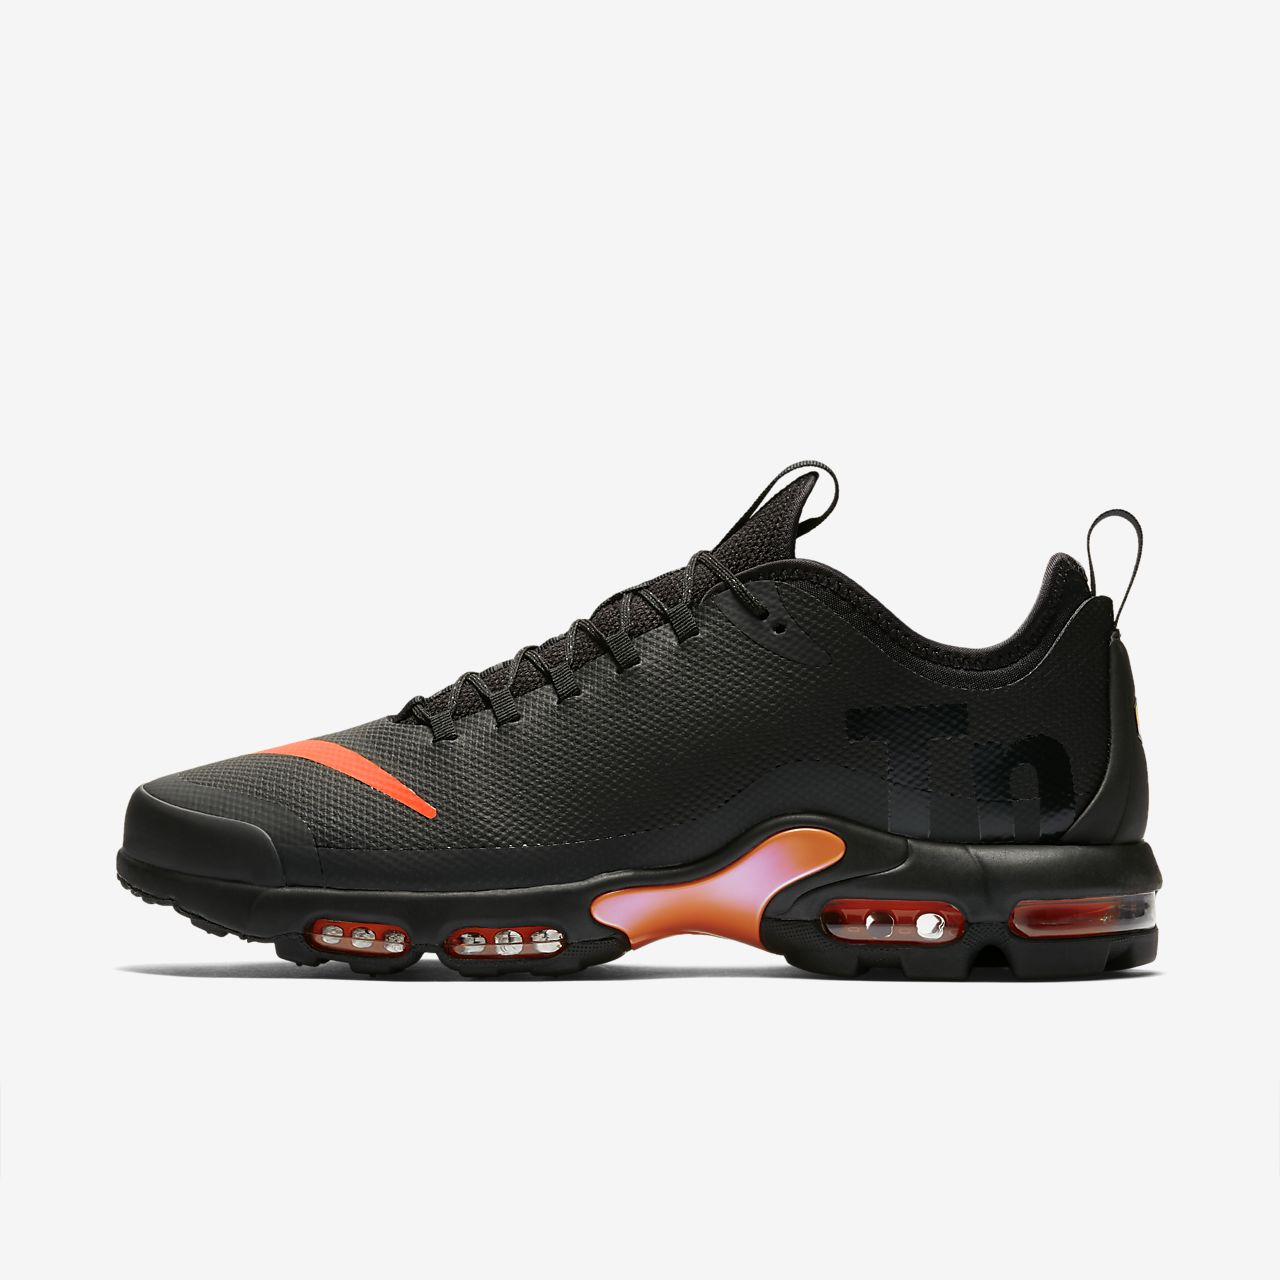 scarpe uomo nike 2018 estate